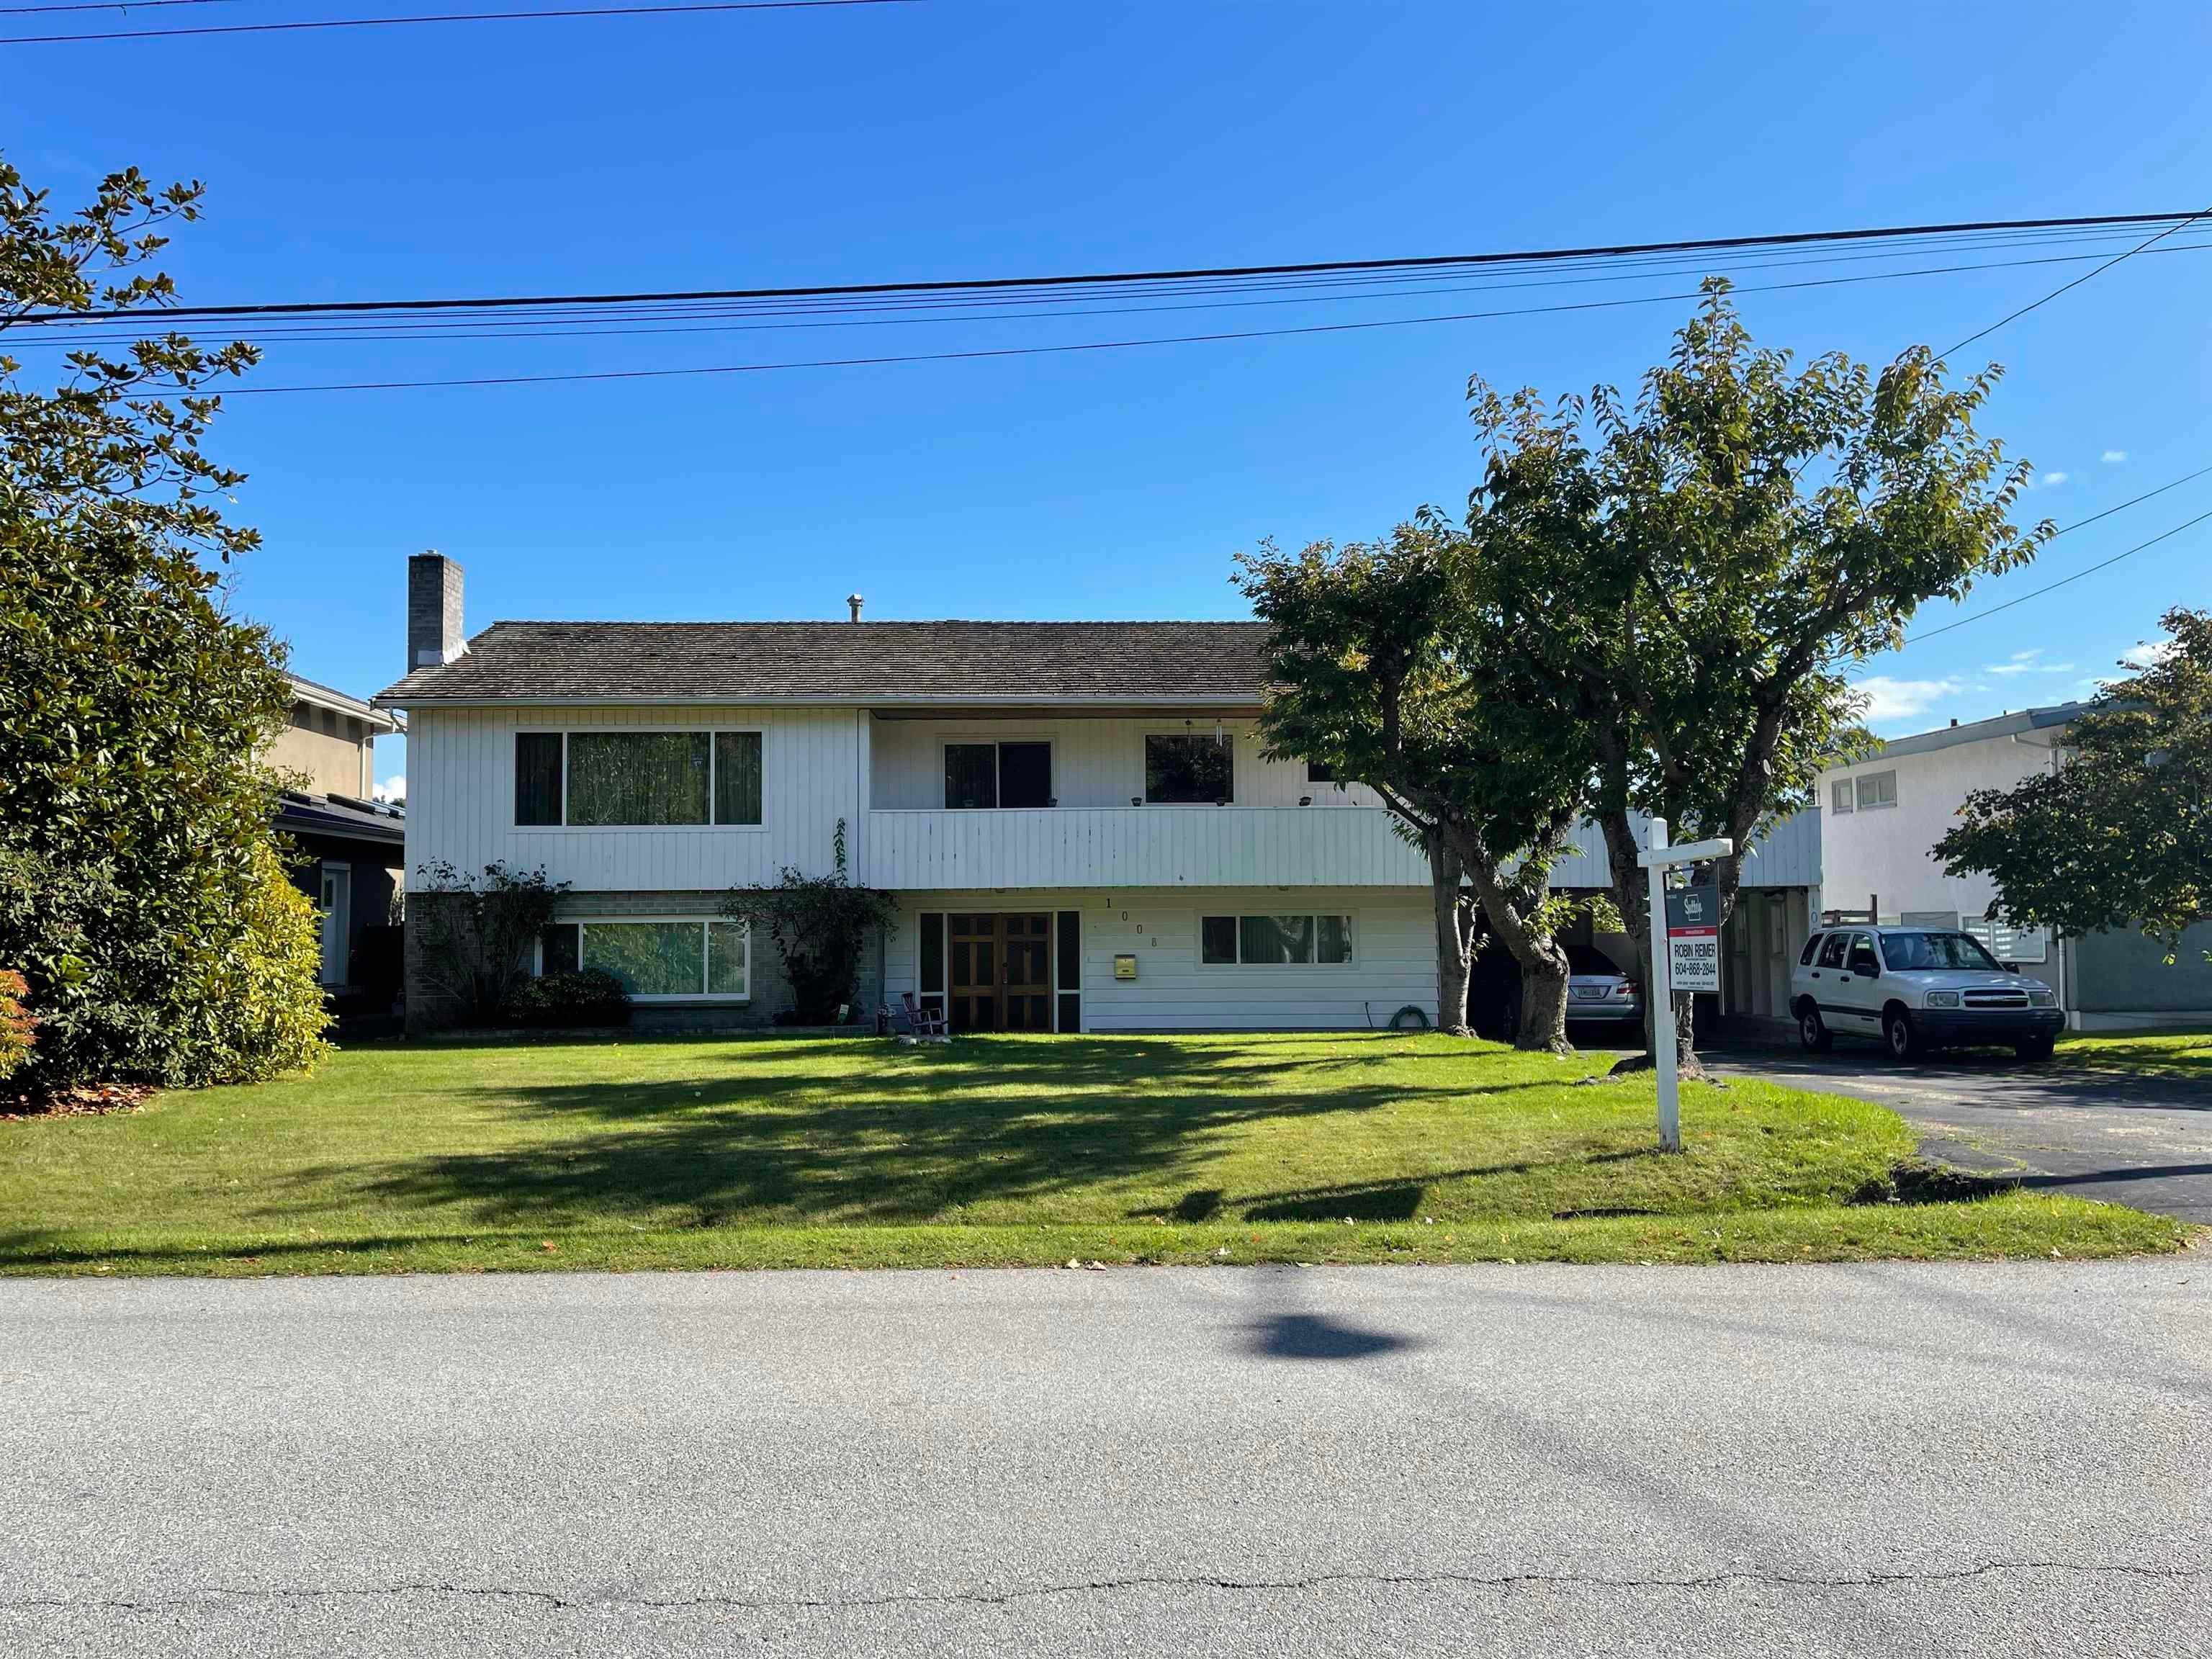 1008 50B STREET - Tsawwassen Central House/Single Family for sale, 4 Bedrooms (R2624844)